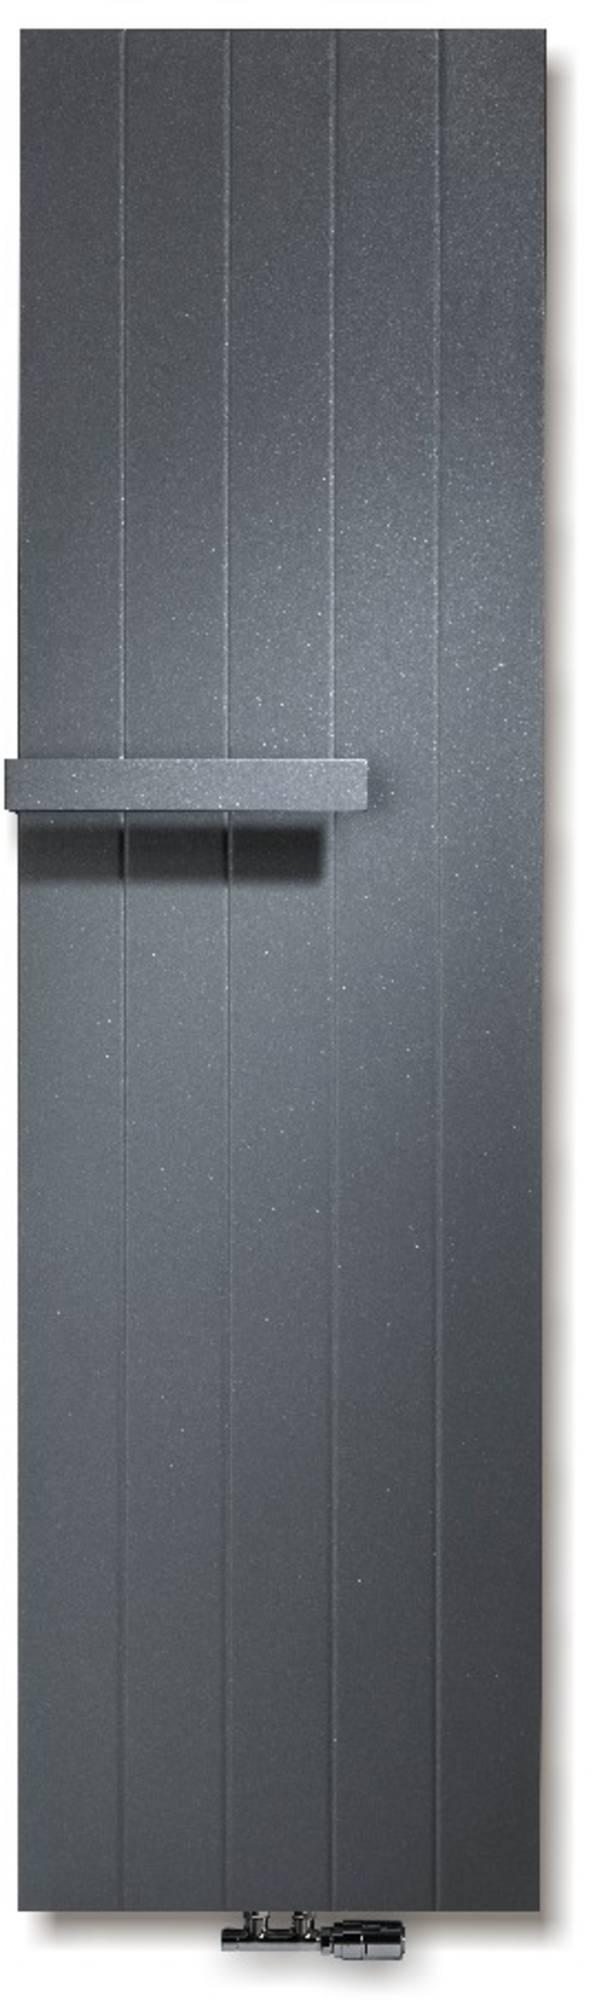 Vasco Vertiline VD design radiator 508x2020 1498w as=1188 Antraciet M301